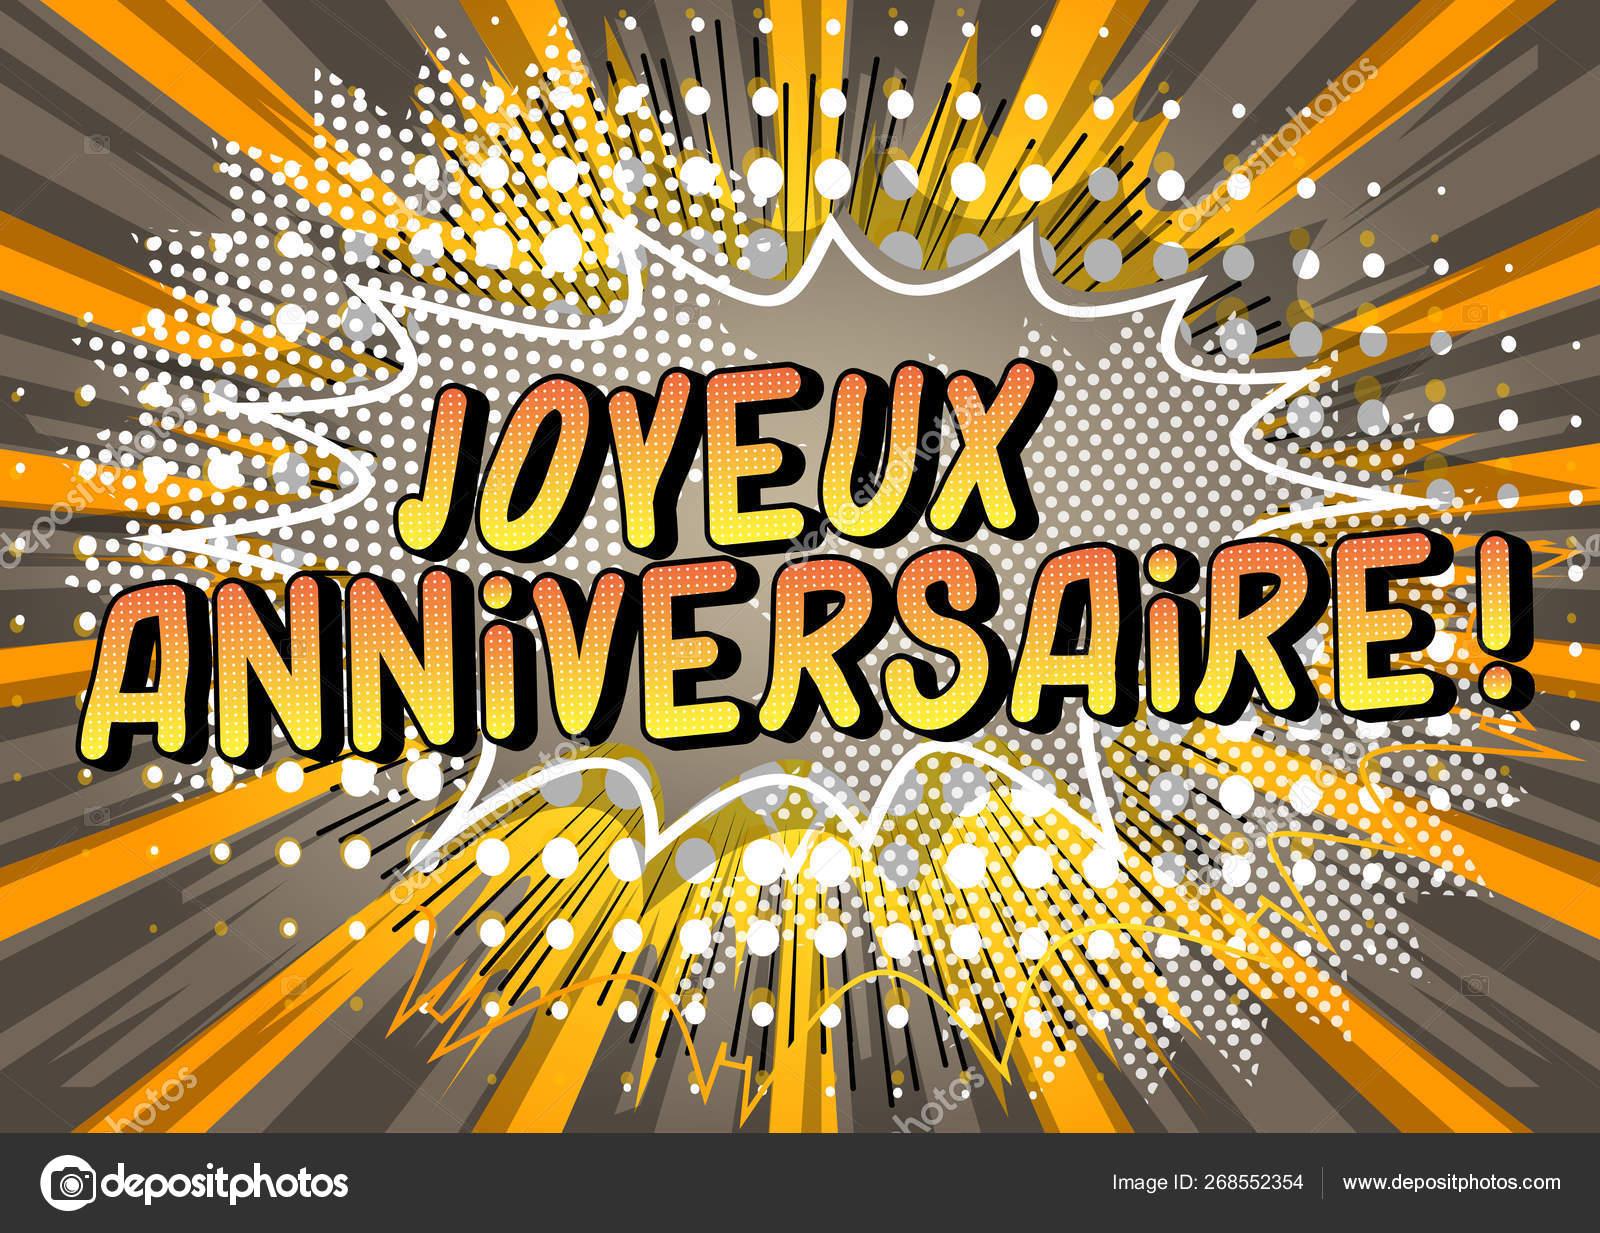 Joyeux Anniversaire Happy Birthday French Vector Illustrated Comic Book Style Stock Vector C Noravector 268552354